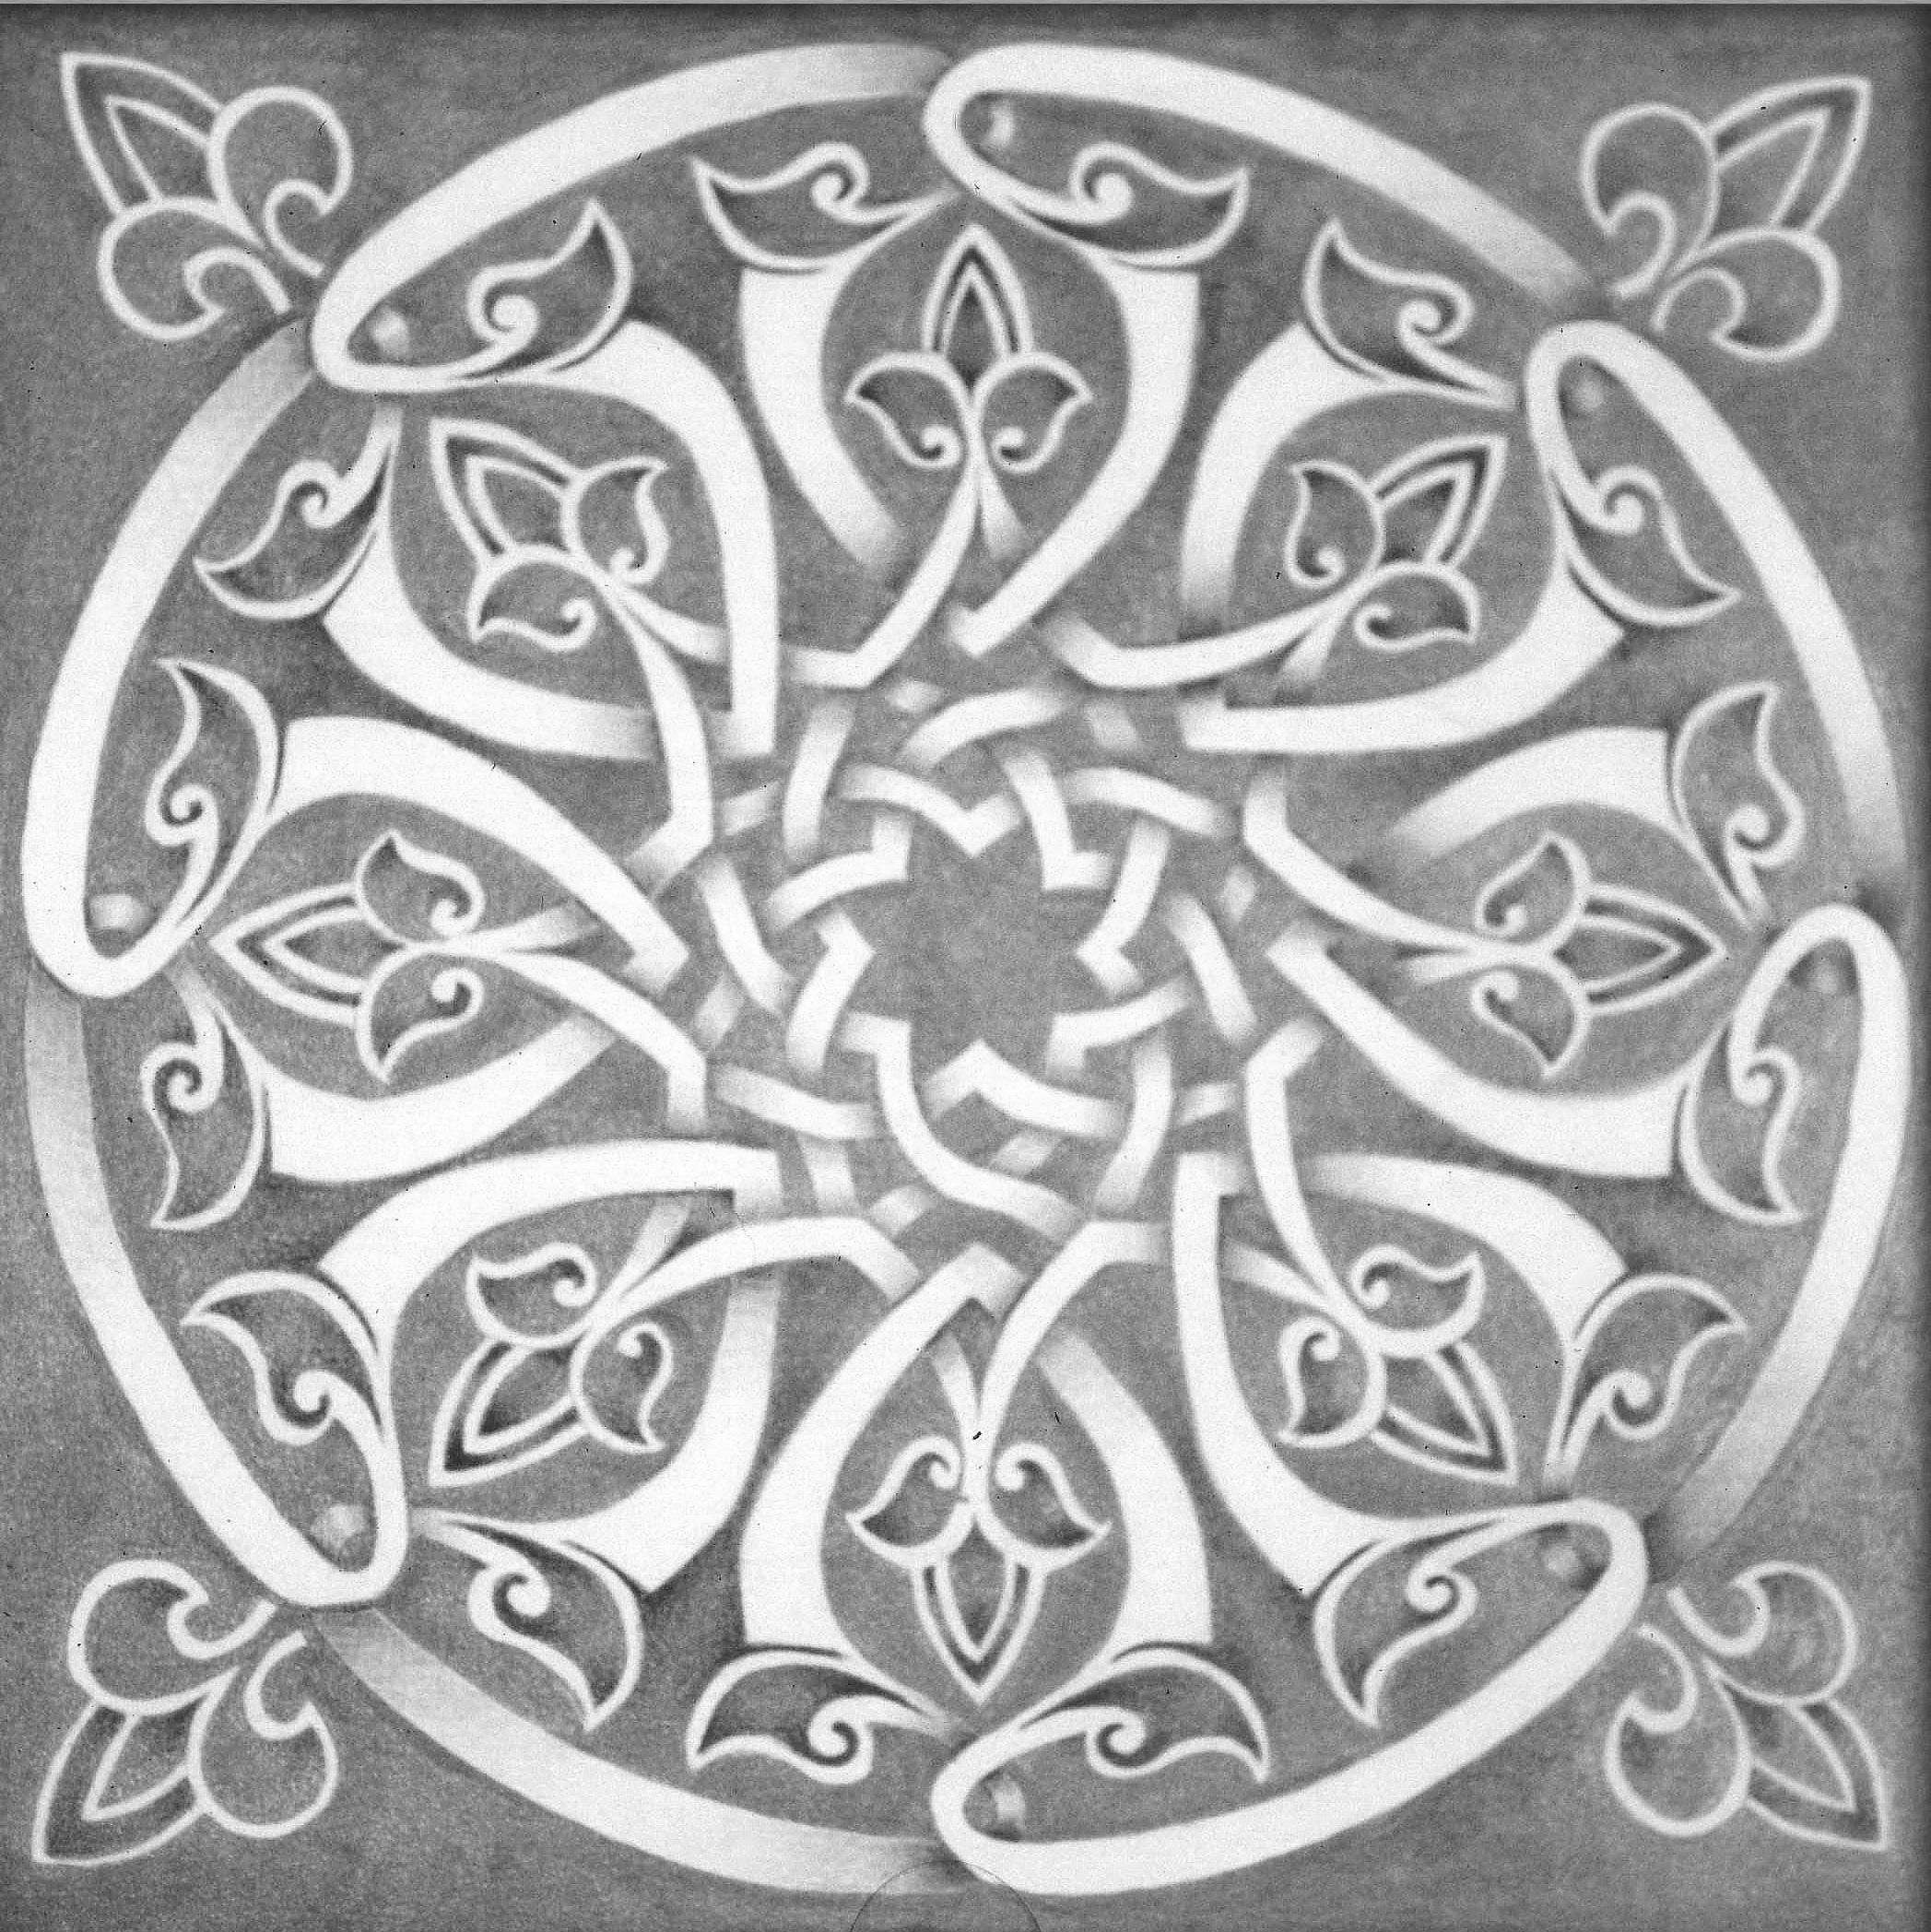 CelticCircle